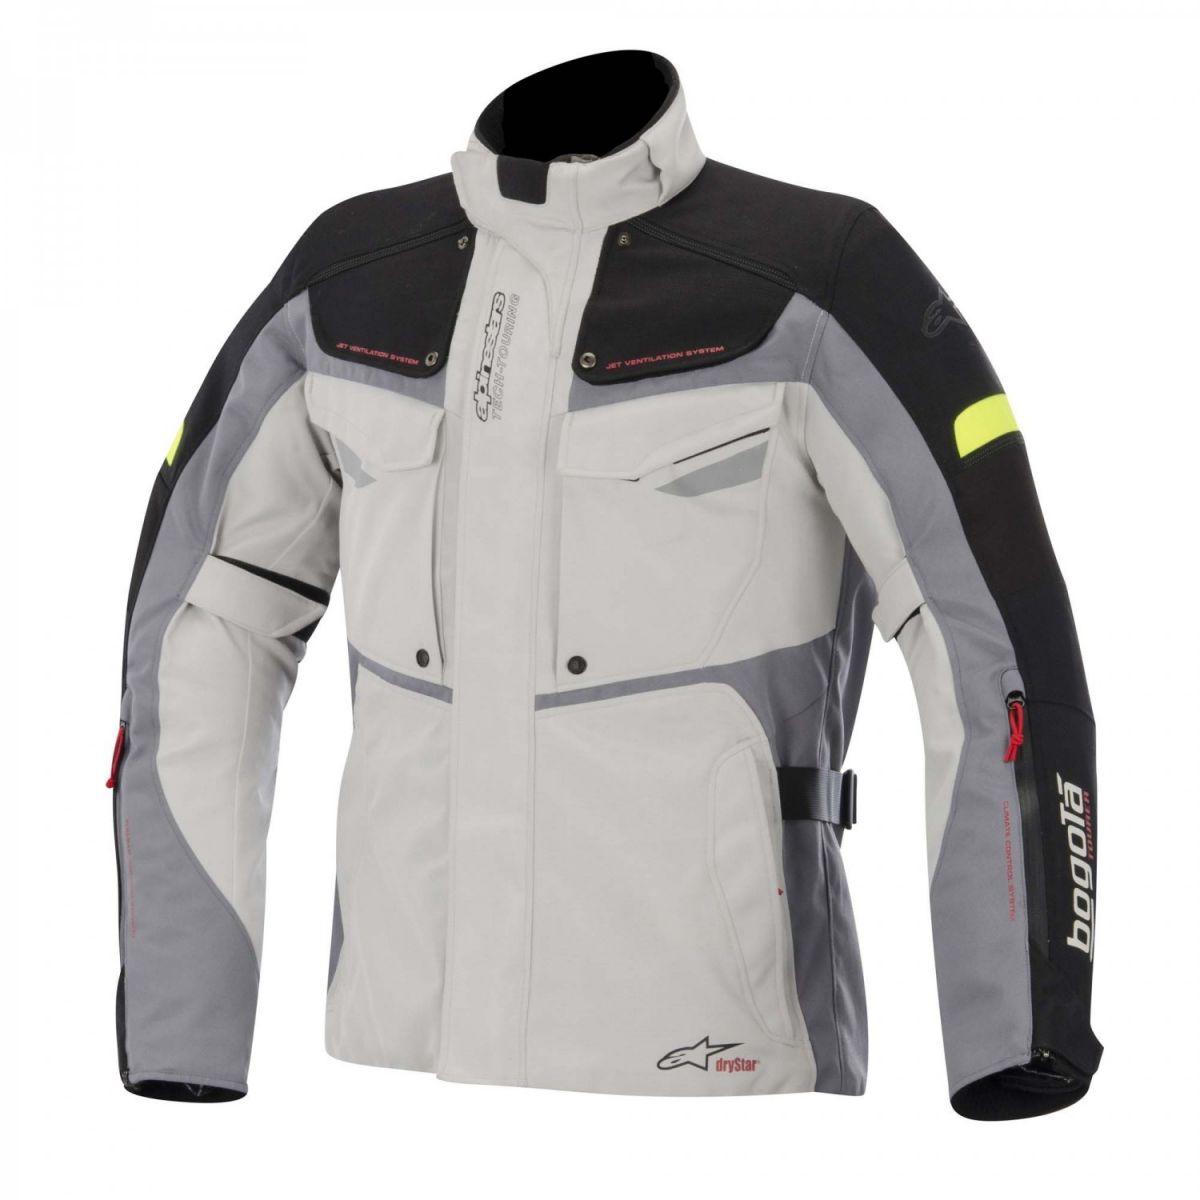 Jaqueta Alpinestars Bogotá Drystar® WP Cinza, Preta e Amarelo/impermeável (COMPRE JUNTO!) para Big Trail (Só M)  - Super Bike - Loja Oficial Alpinestars